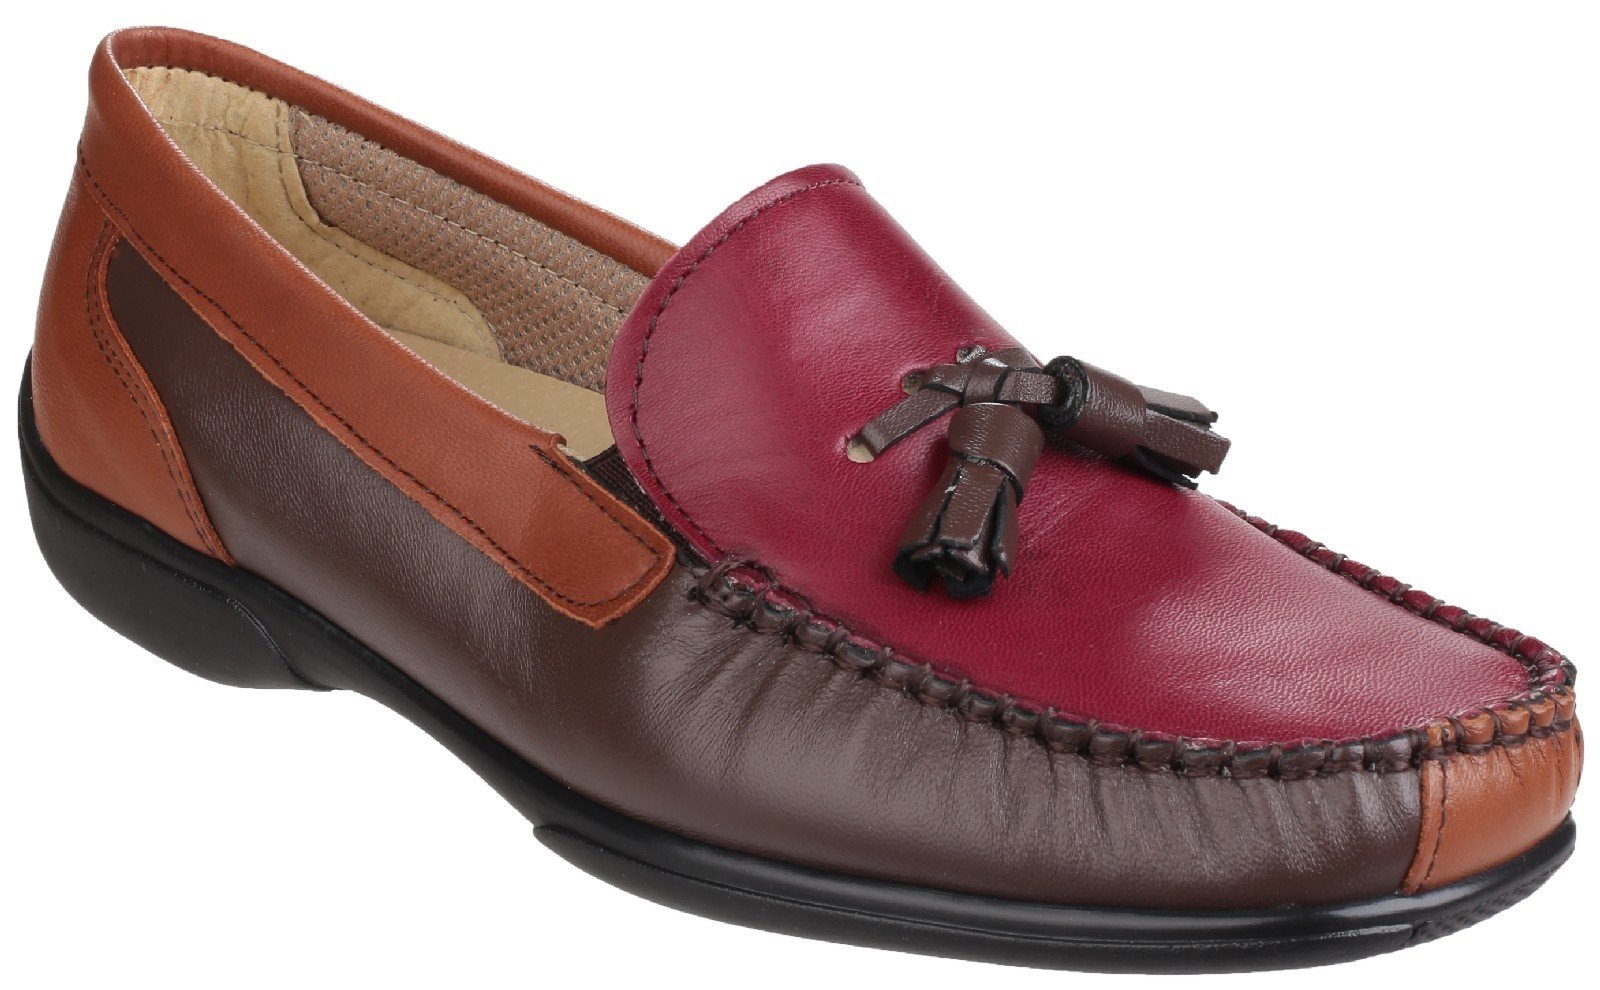 Cotswold Men's Biddlestone Slip On Loafer Shoe Various Colours 20285 - Chestnut/Tan/Wine 3